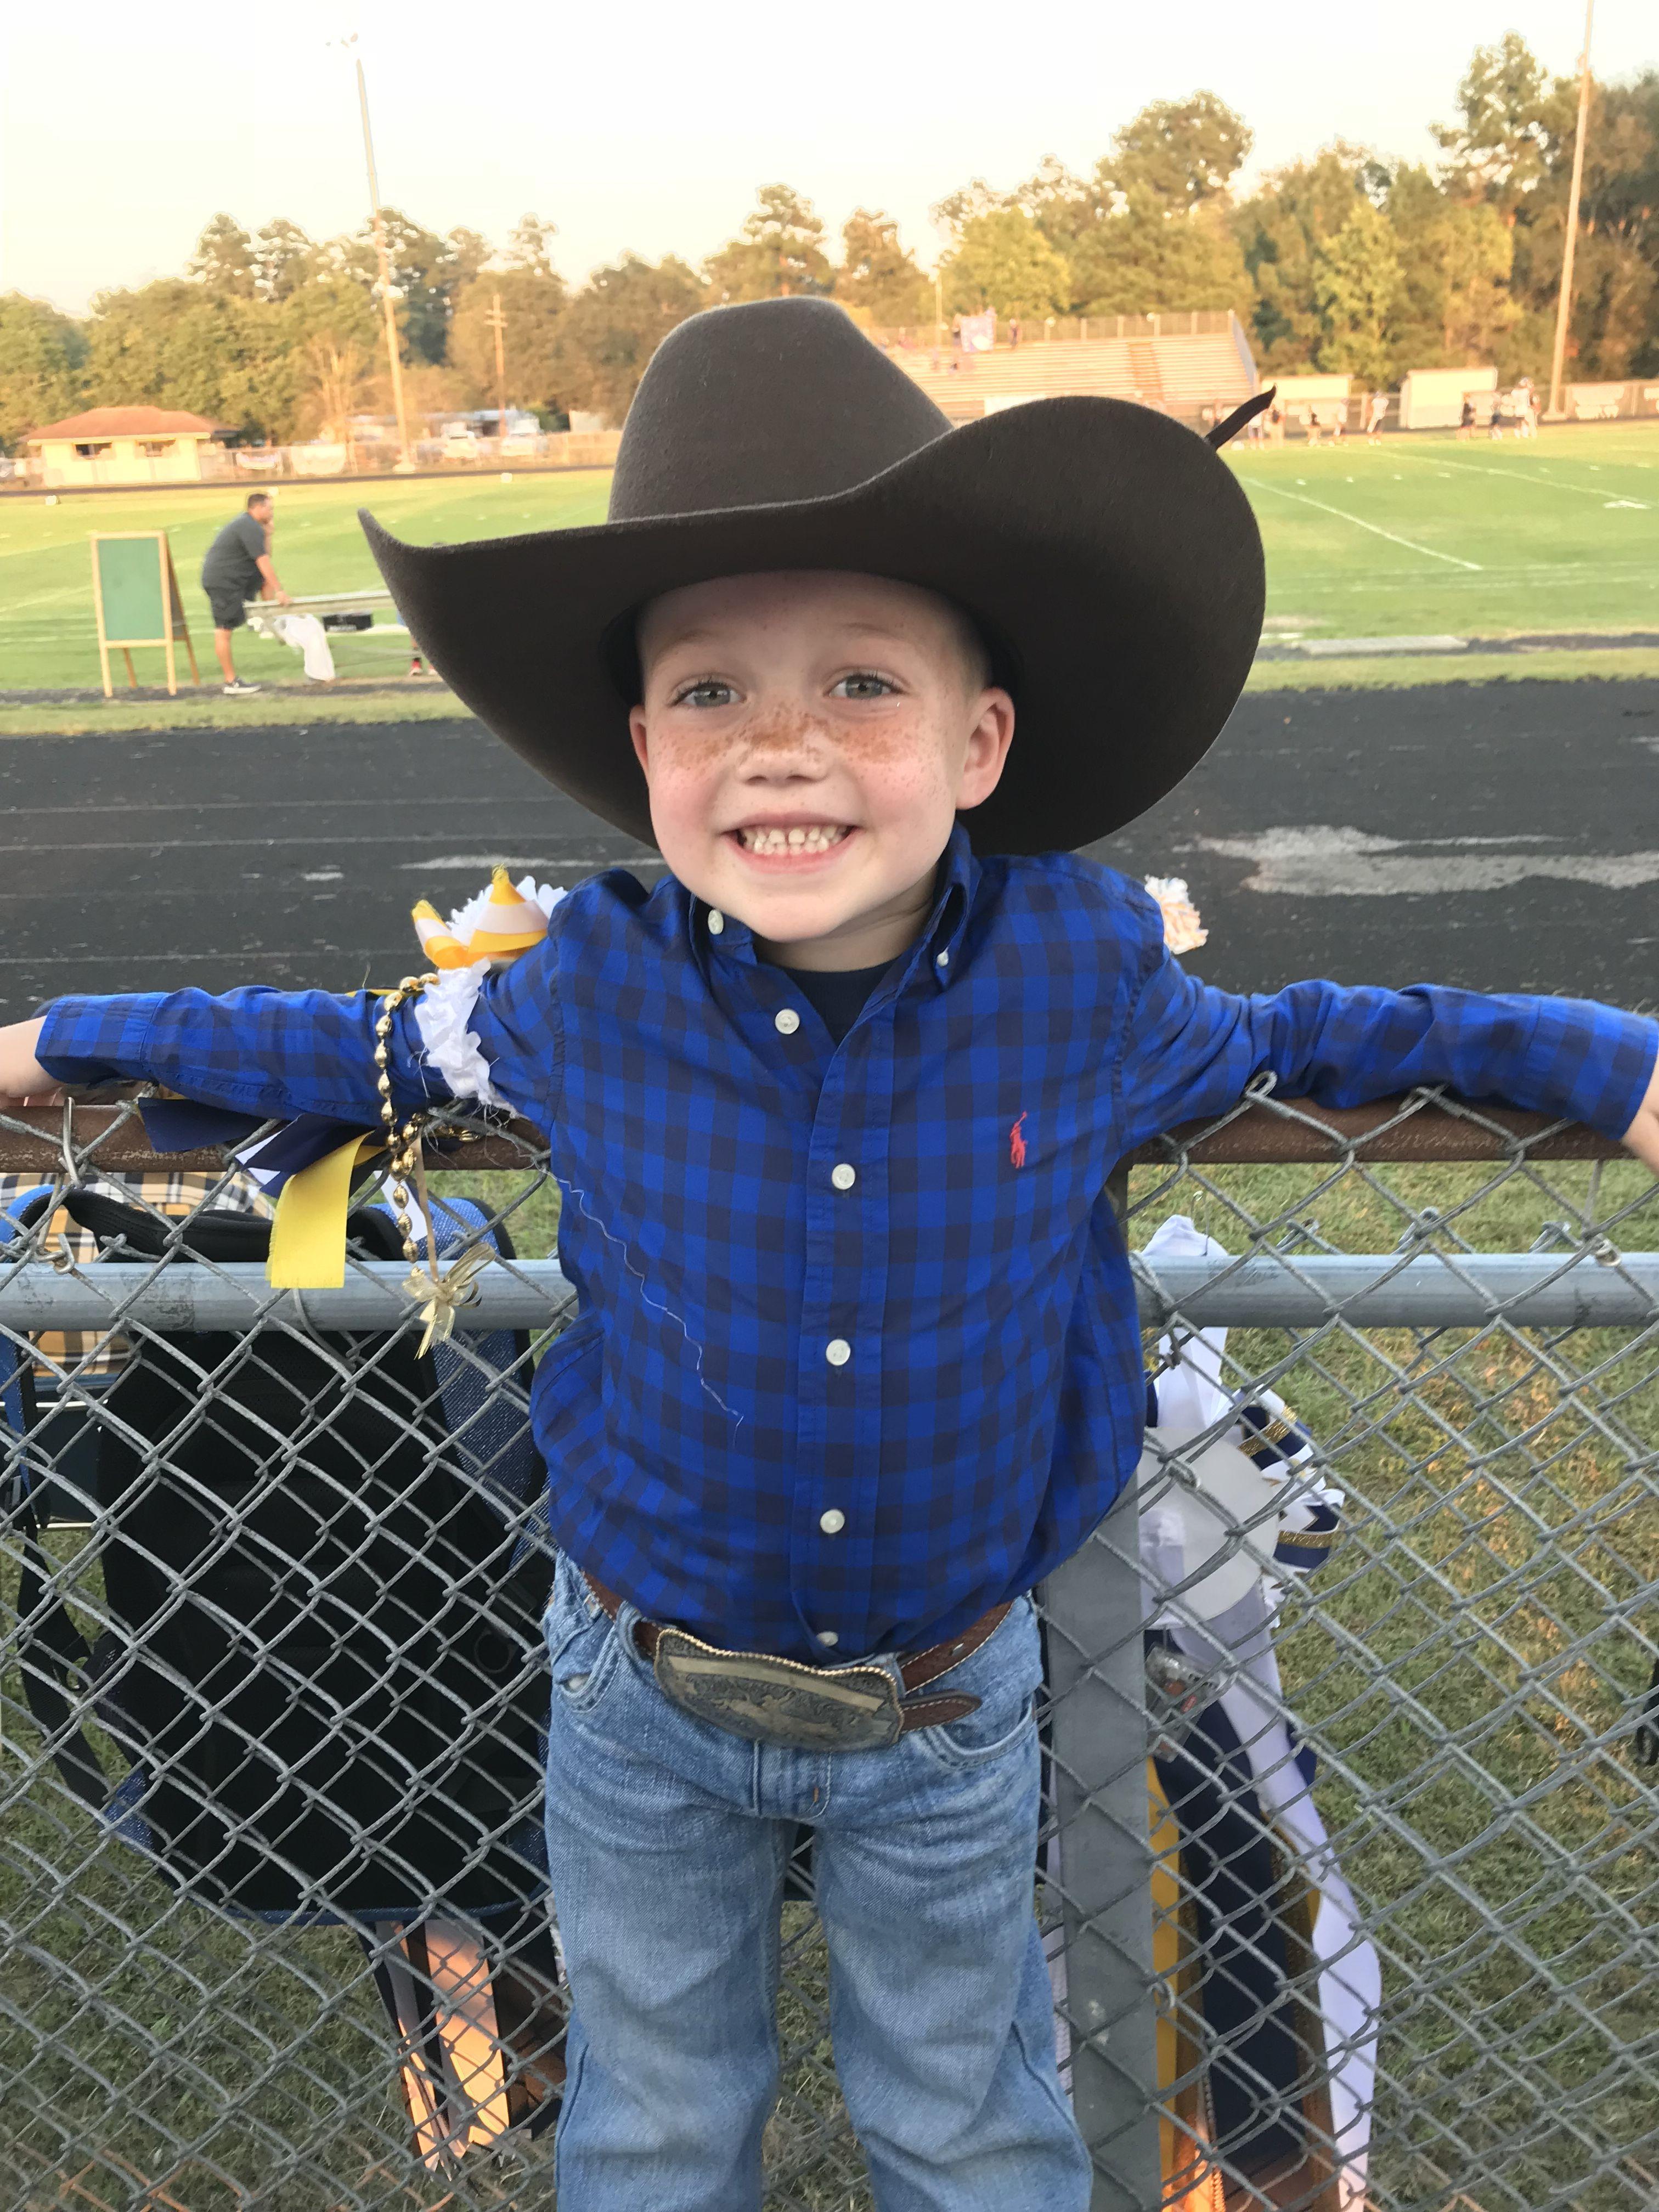 Homecoming little boy Dutch | Fashion, Cowboy hats, Homecoming